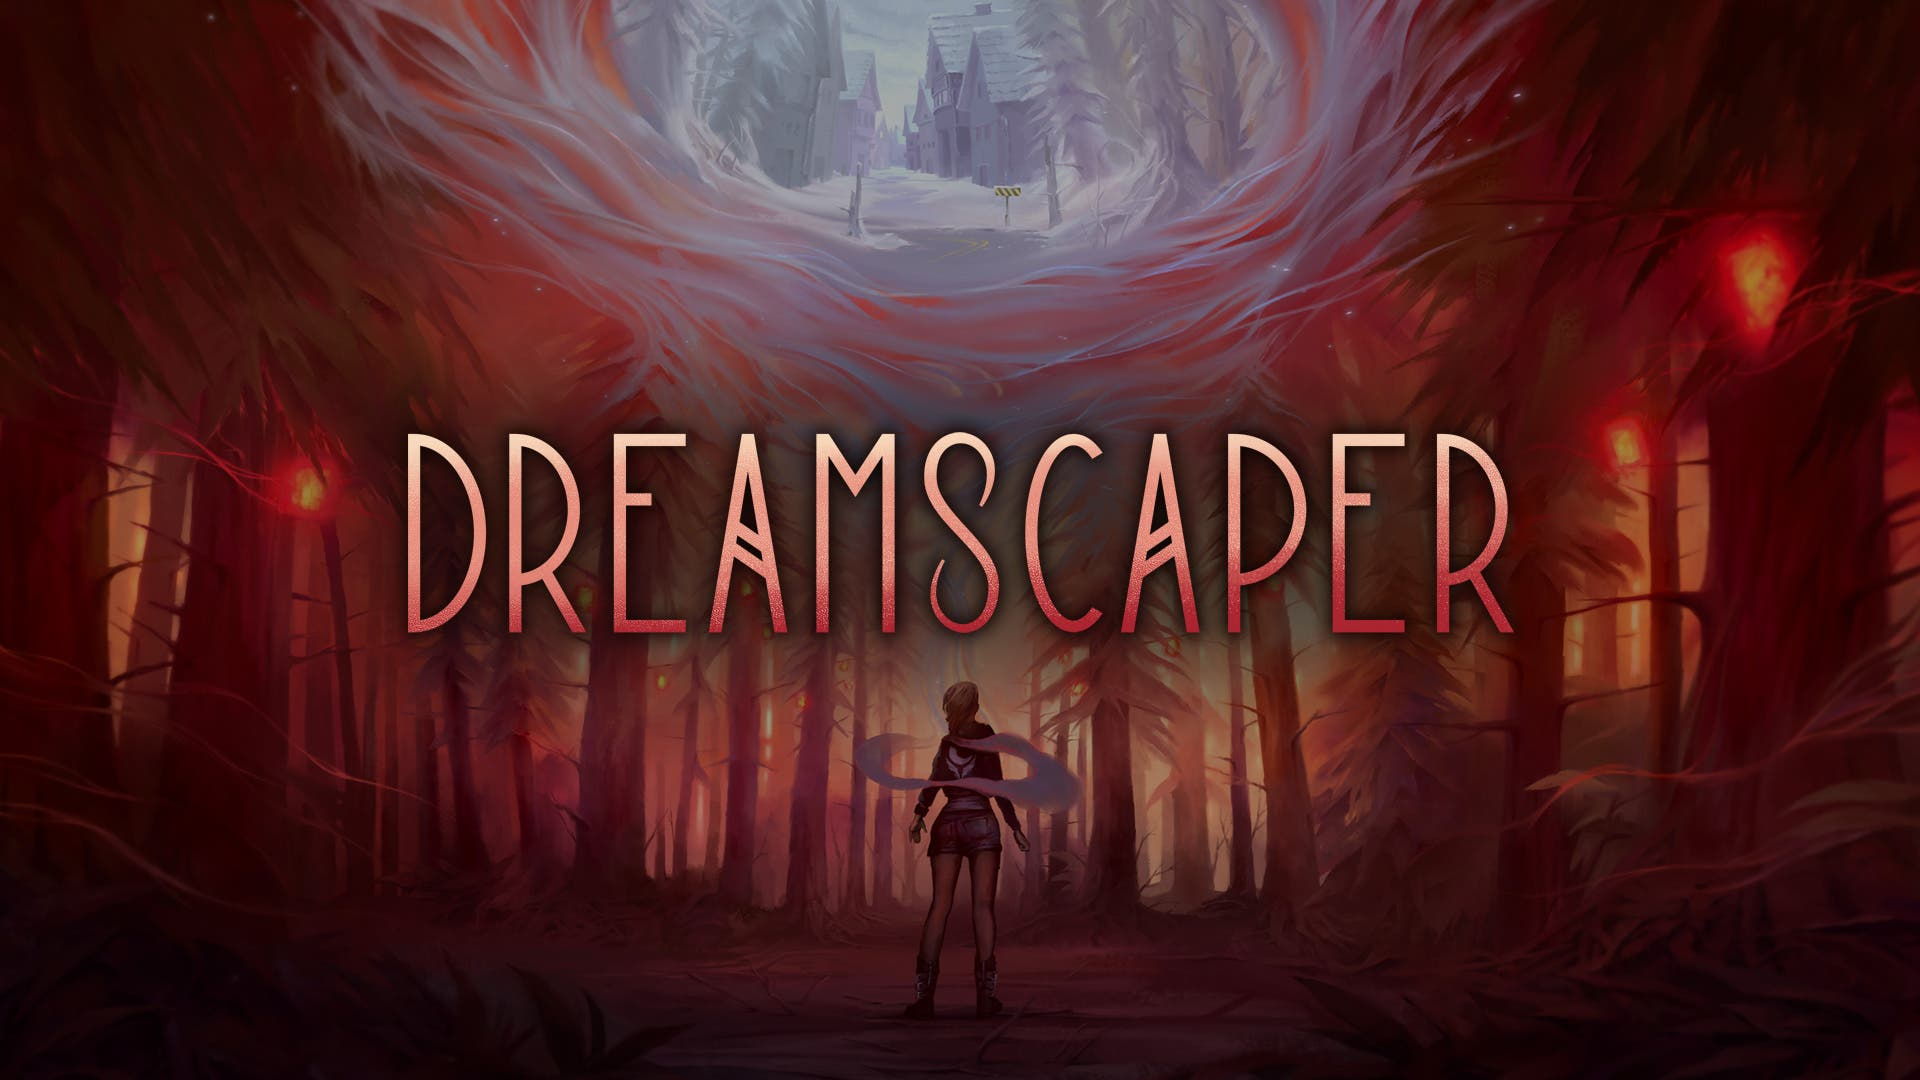 Dreamscaper earlyaccesspreview bg